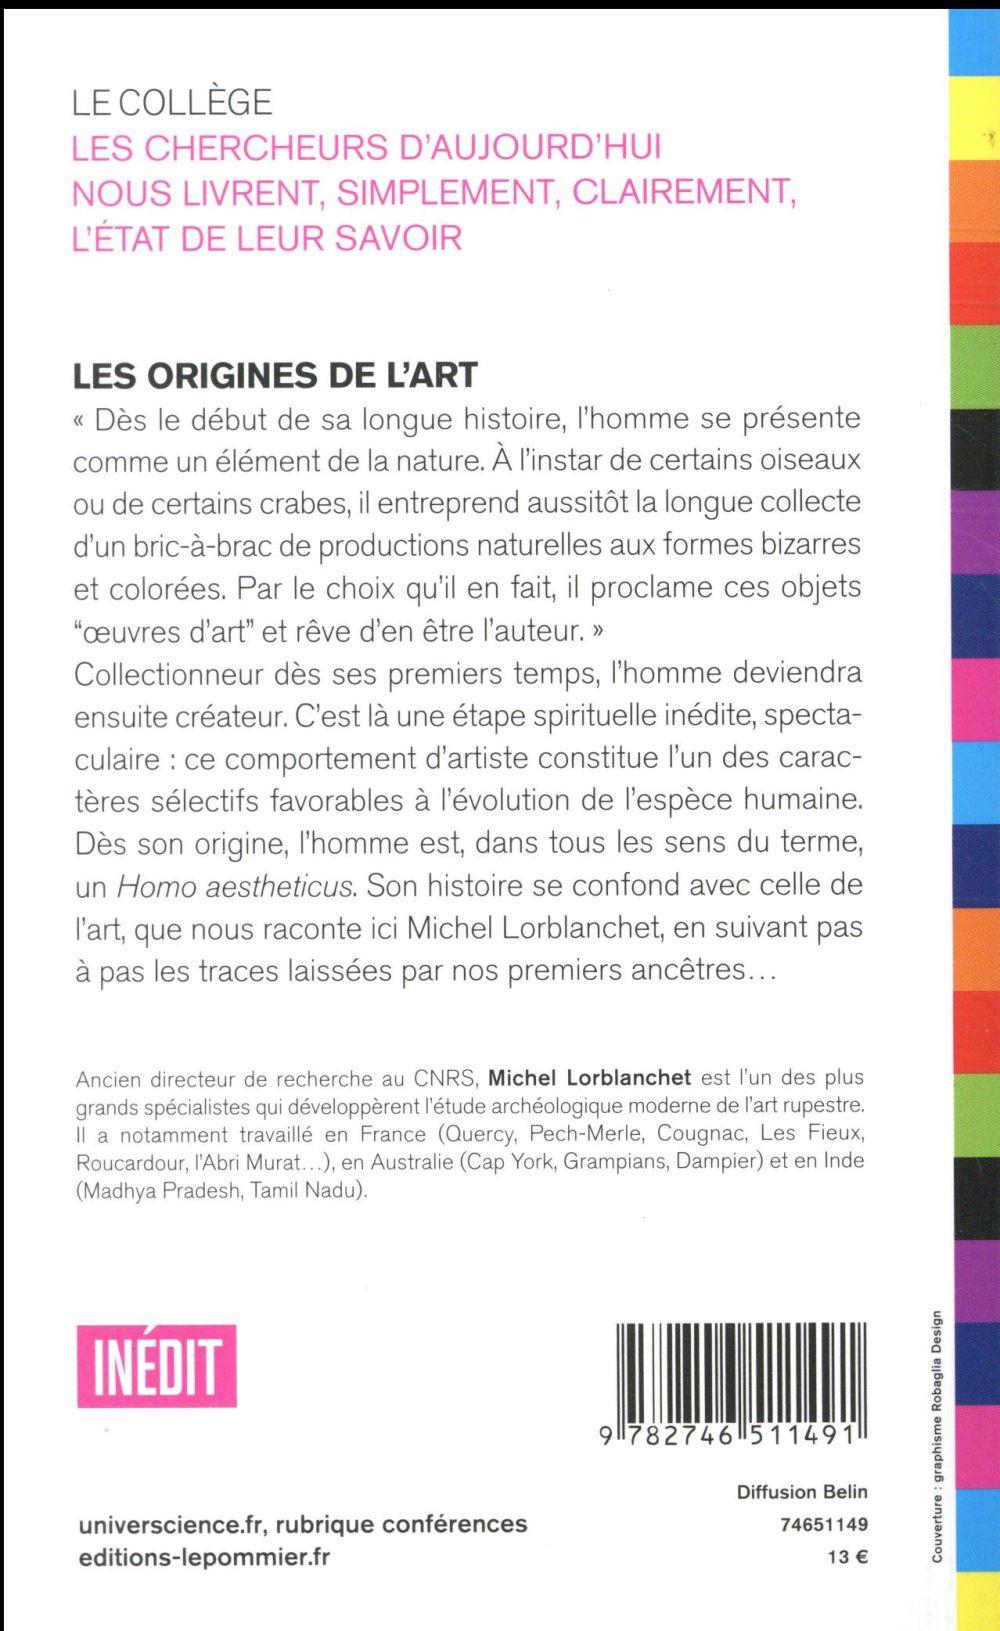 Les origines de l'art (édition 2017)